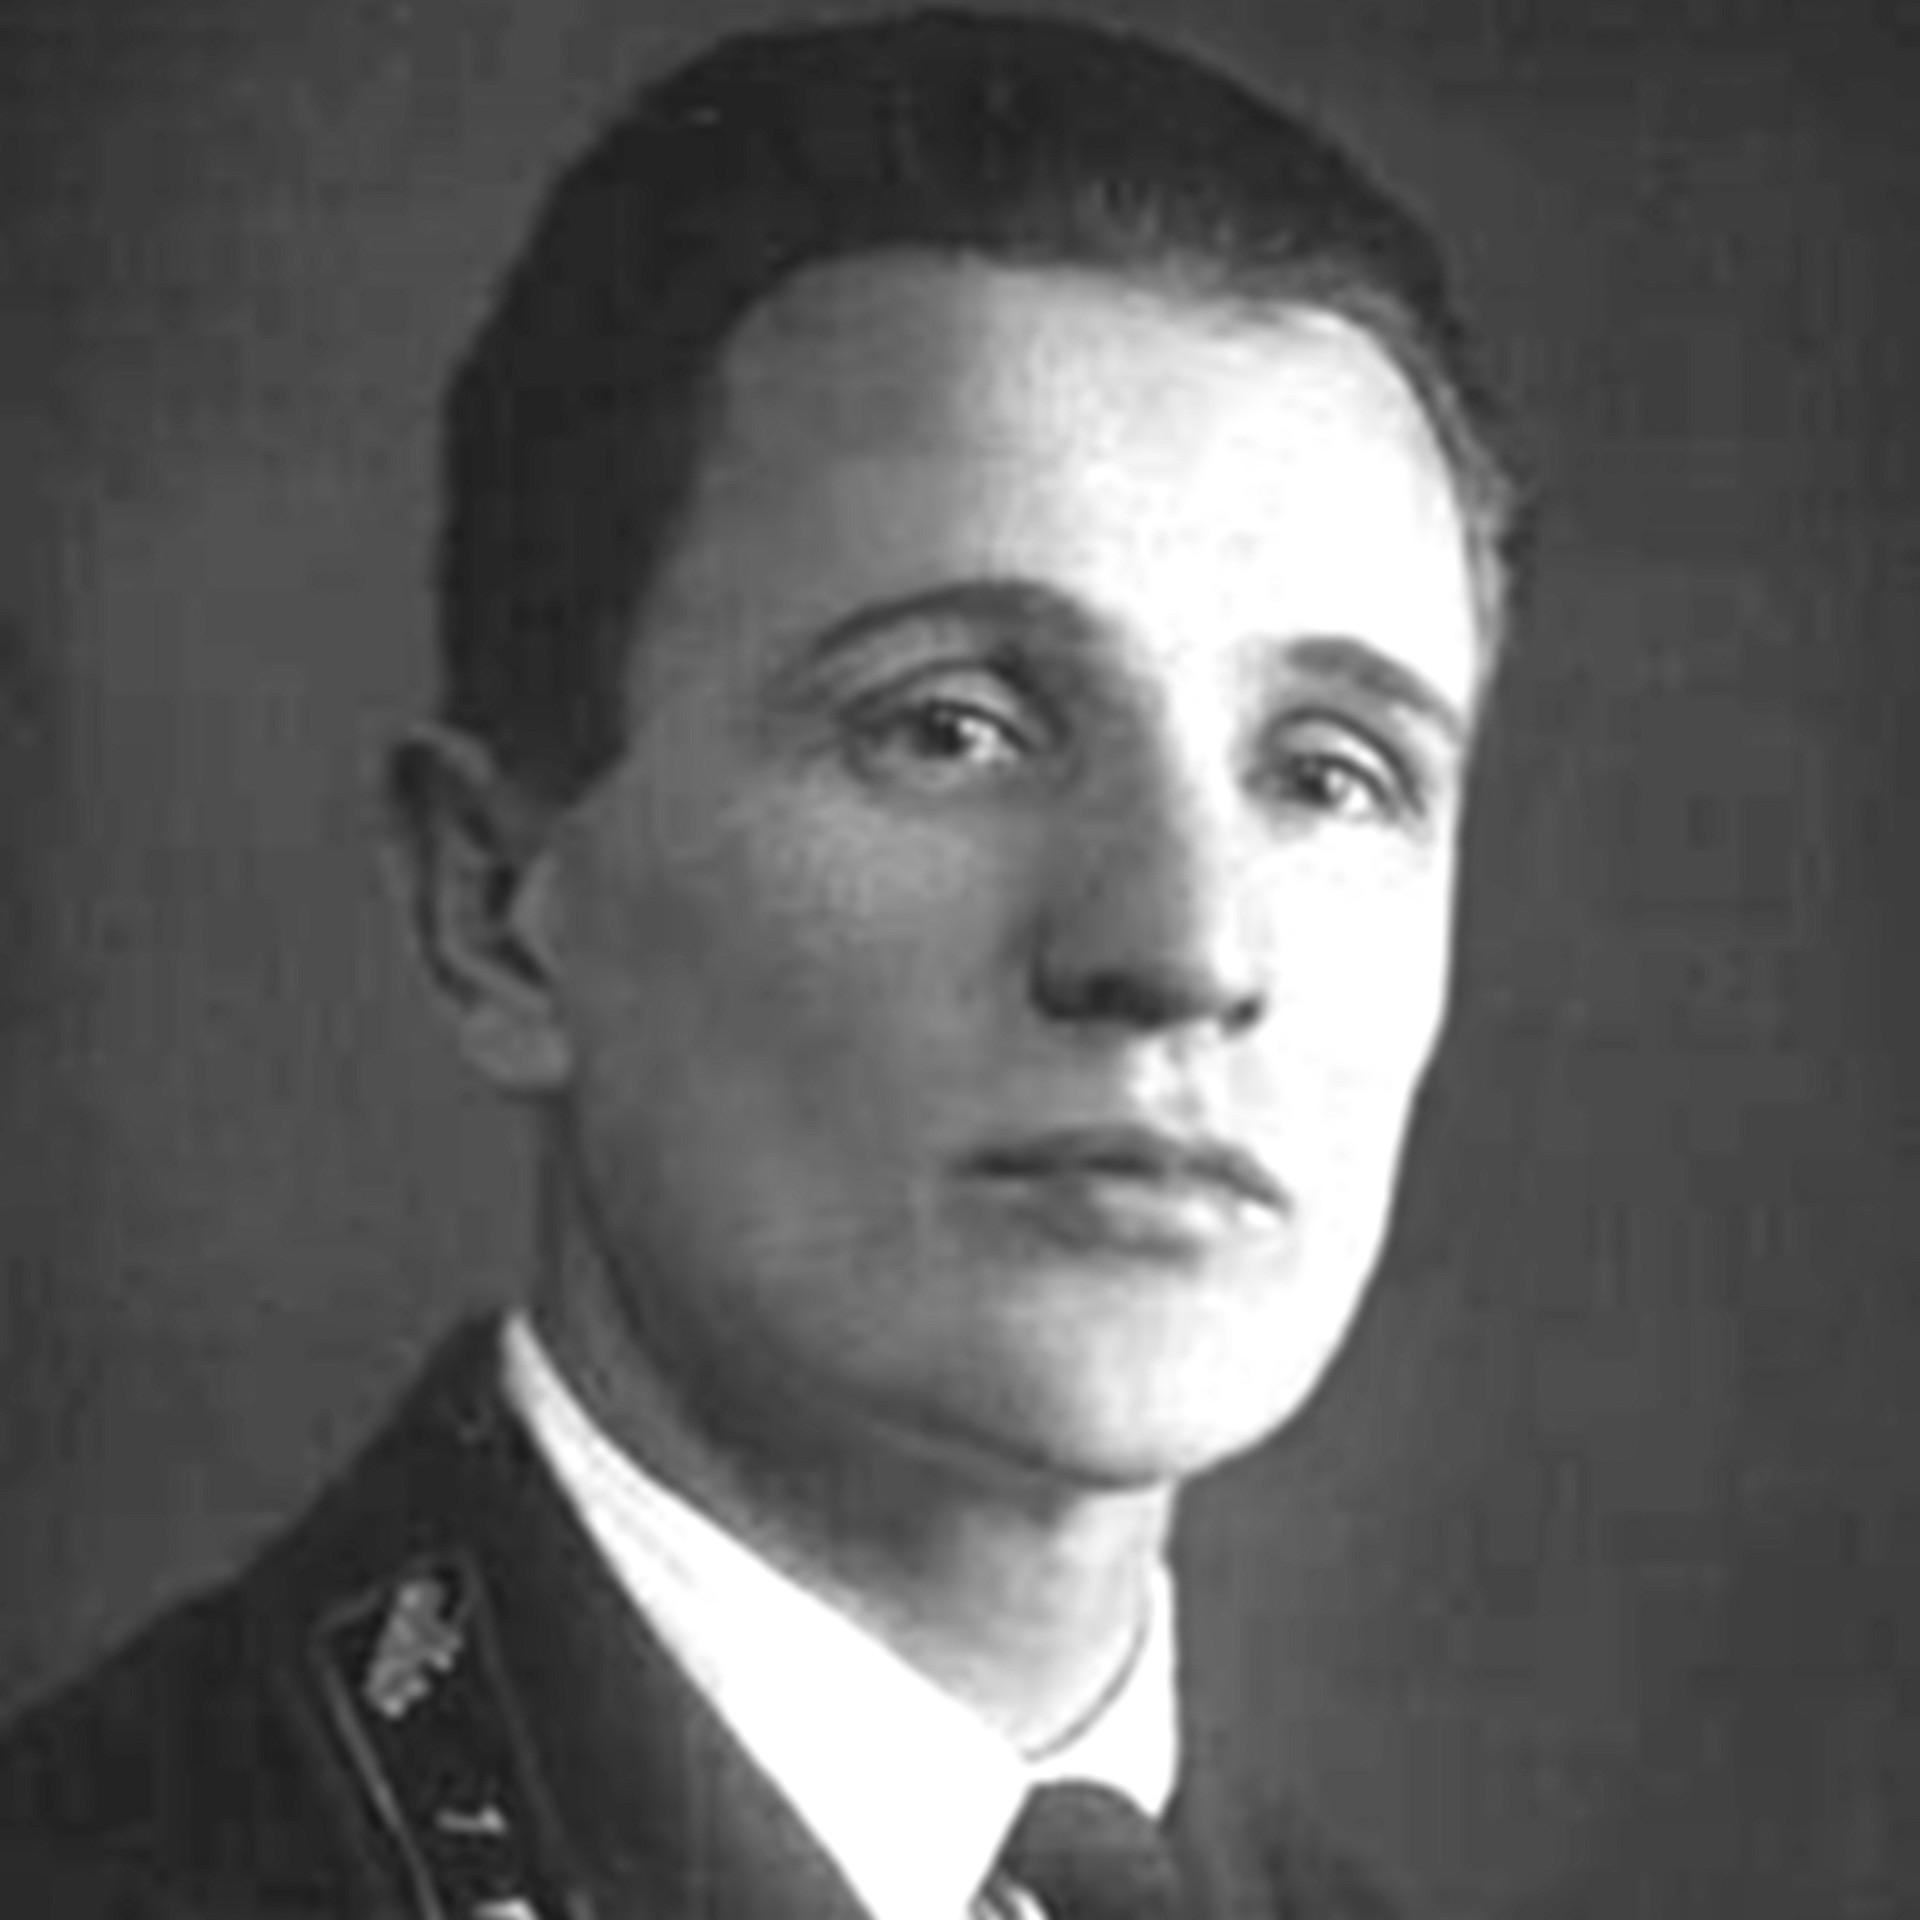 Zinovi Kolobanov